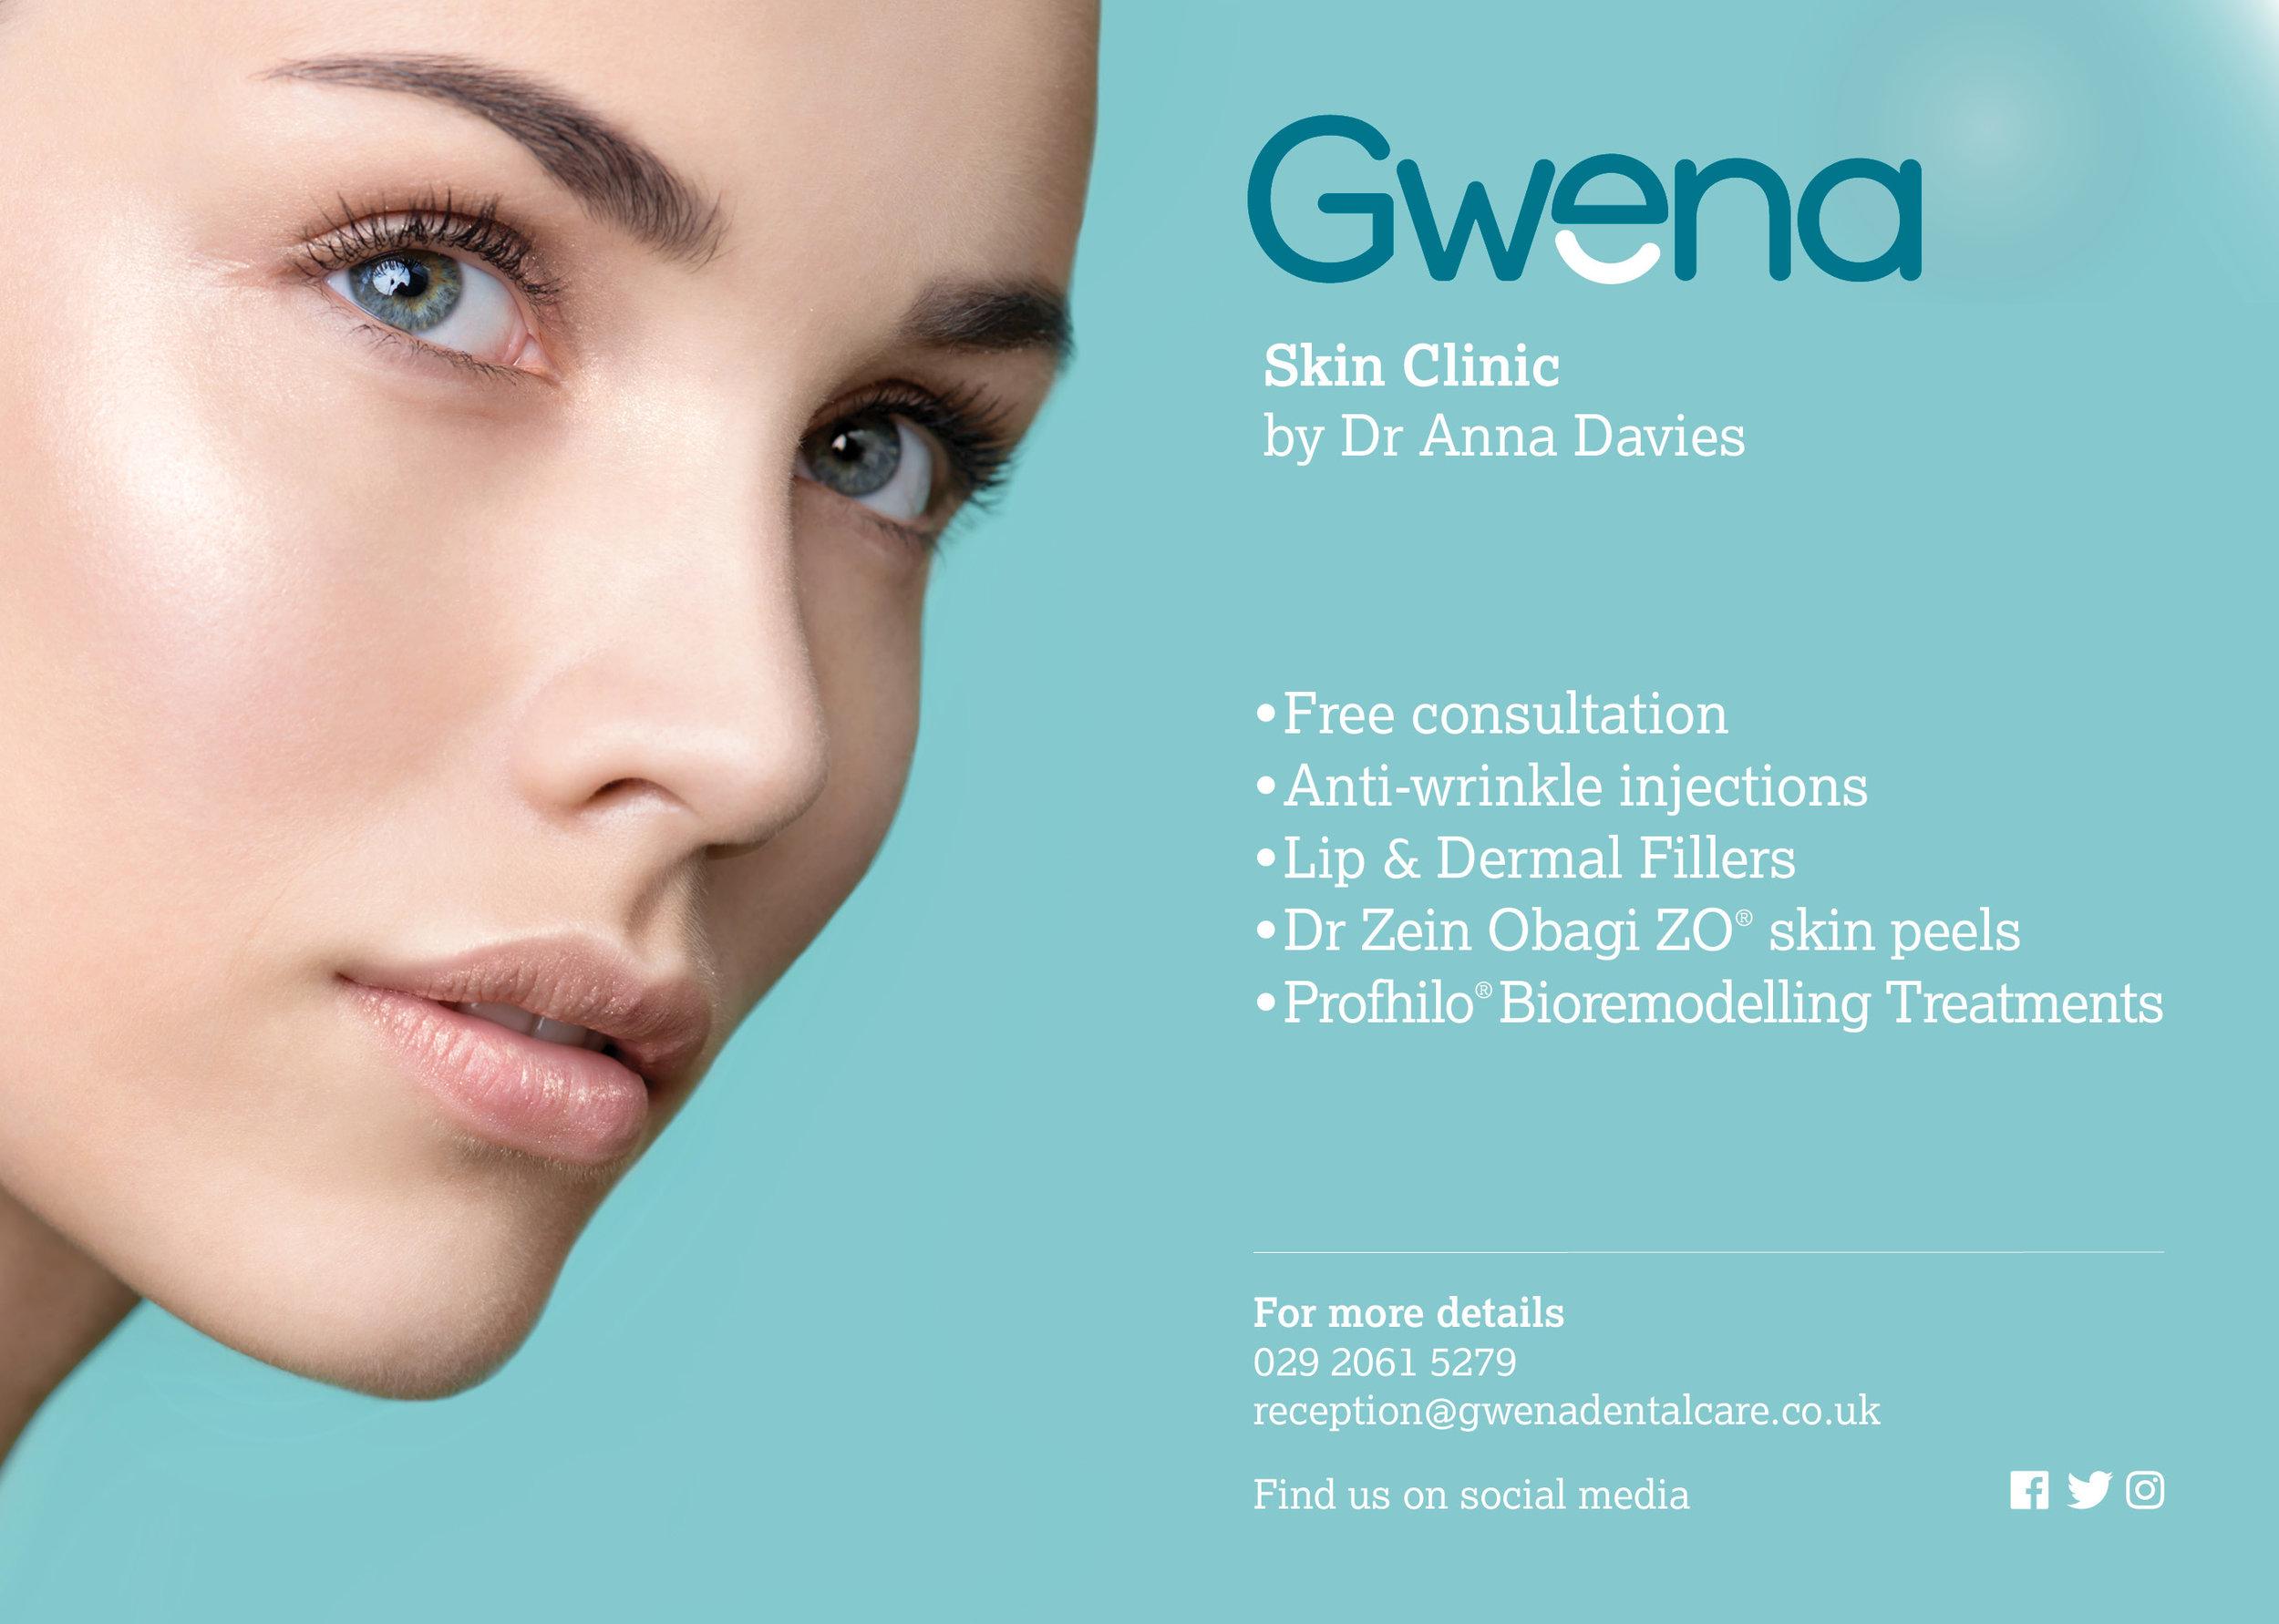 Gwena_Cosmetic_Advert_01.jpg